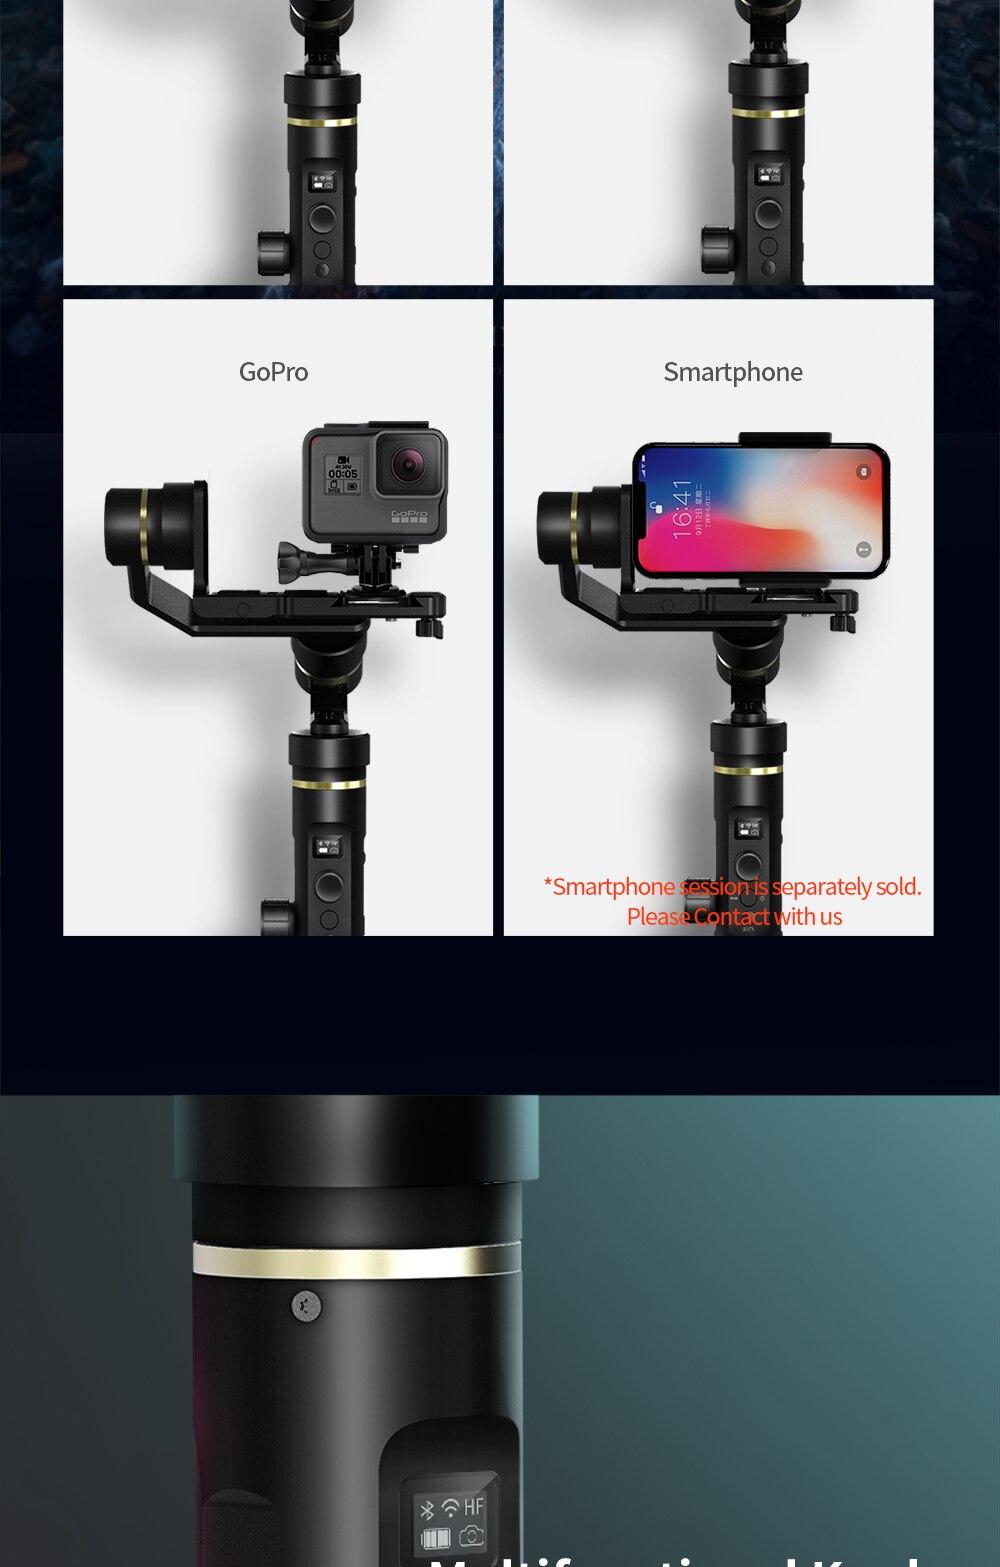 FeiyuTech G6 Plus 3-Axis Handheld Gimbal Stabilizer for Mirrorless Camera Pocket Camera GoPro Smartphone Payload 800g Feiyu G6P 3